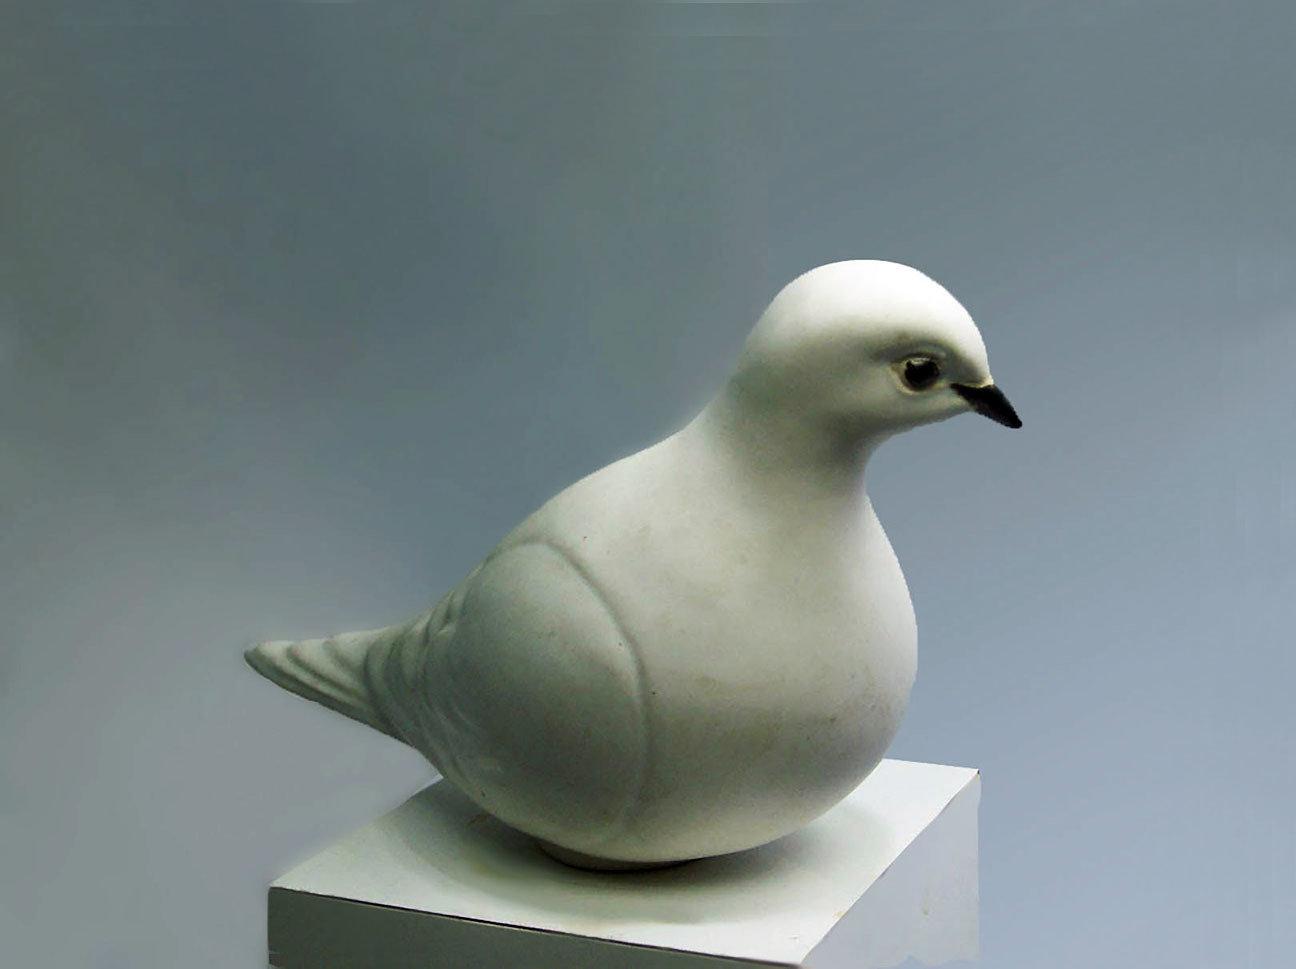 White Ceramic Dove, Facing Left, 2nd Quality